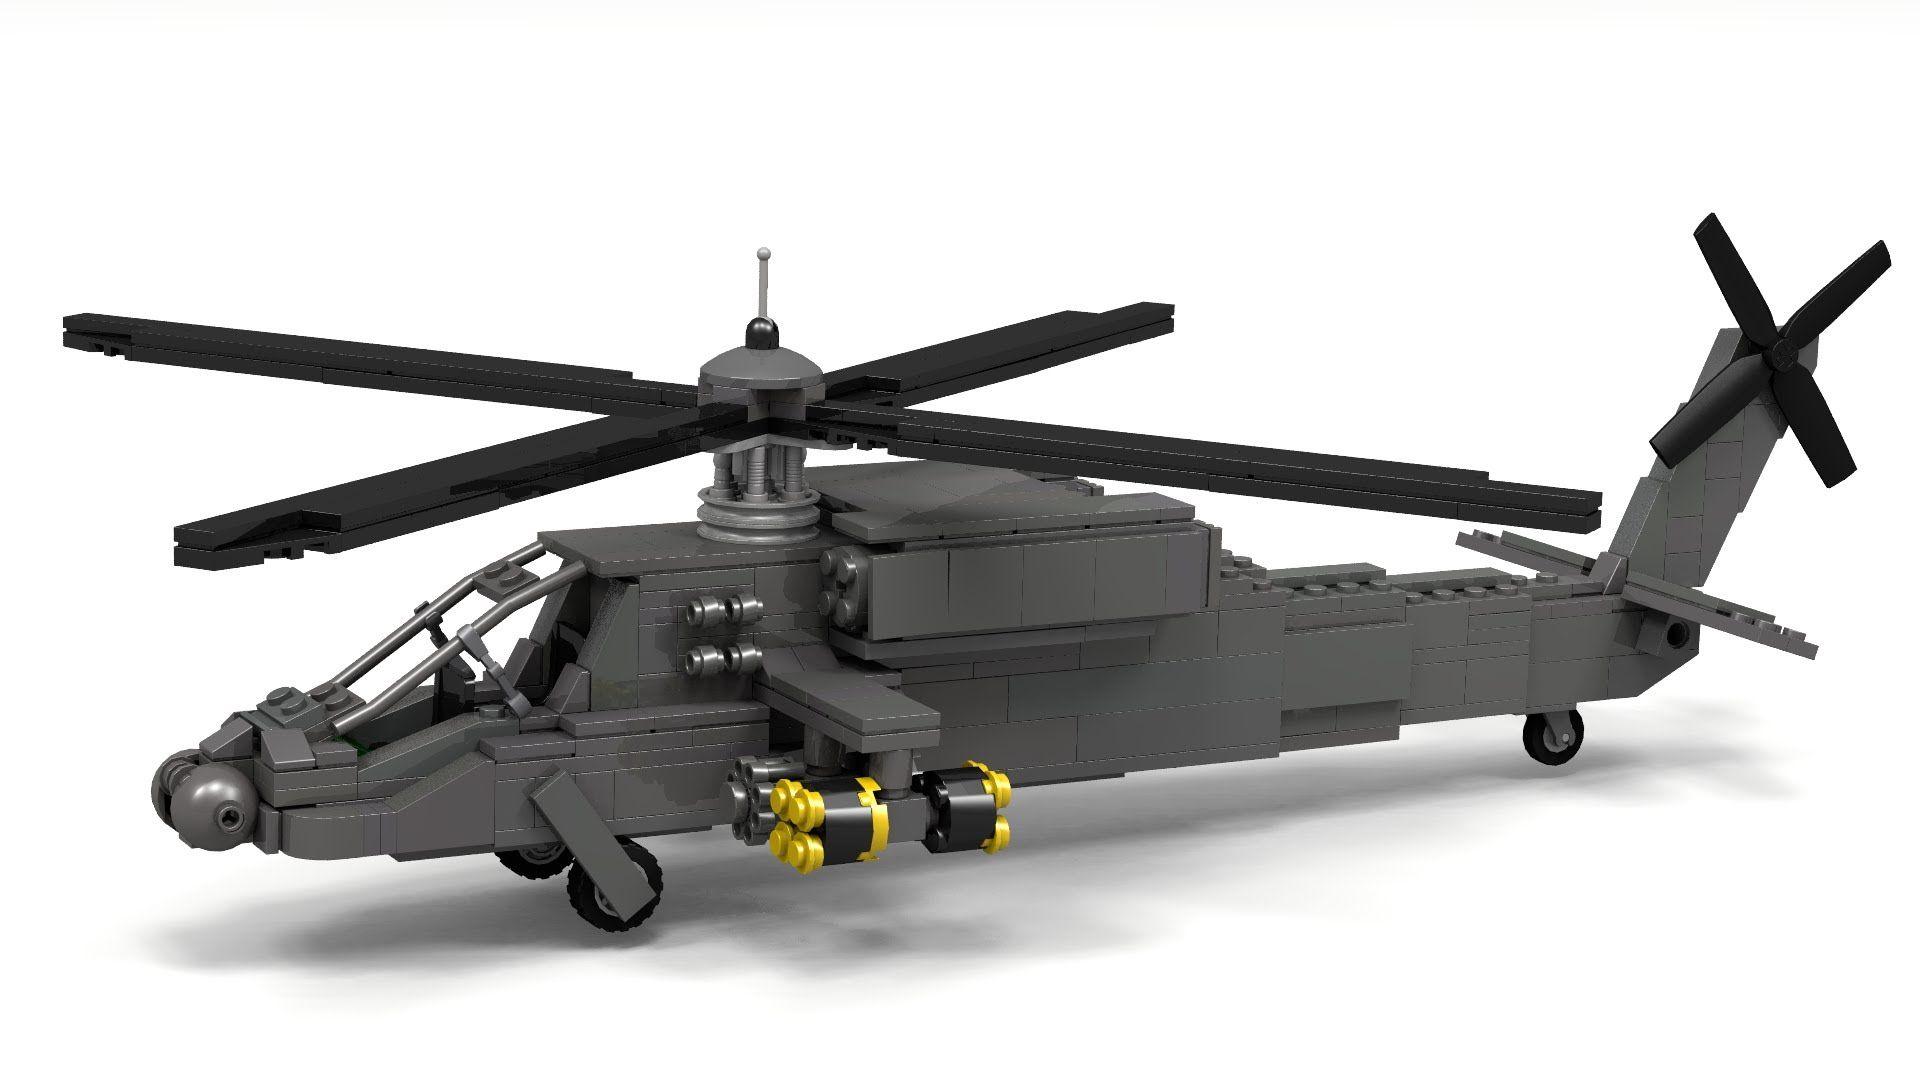 Lego AH-64 Apache Instructions | LEGO | Pinterest | Lego